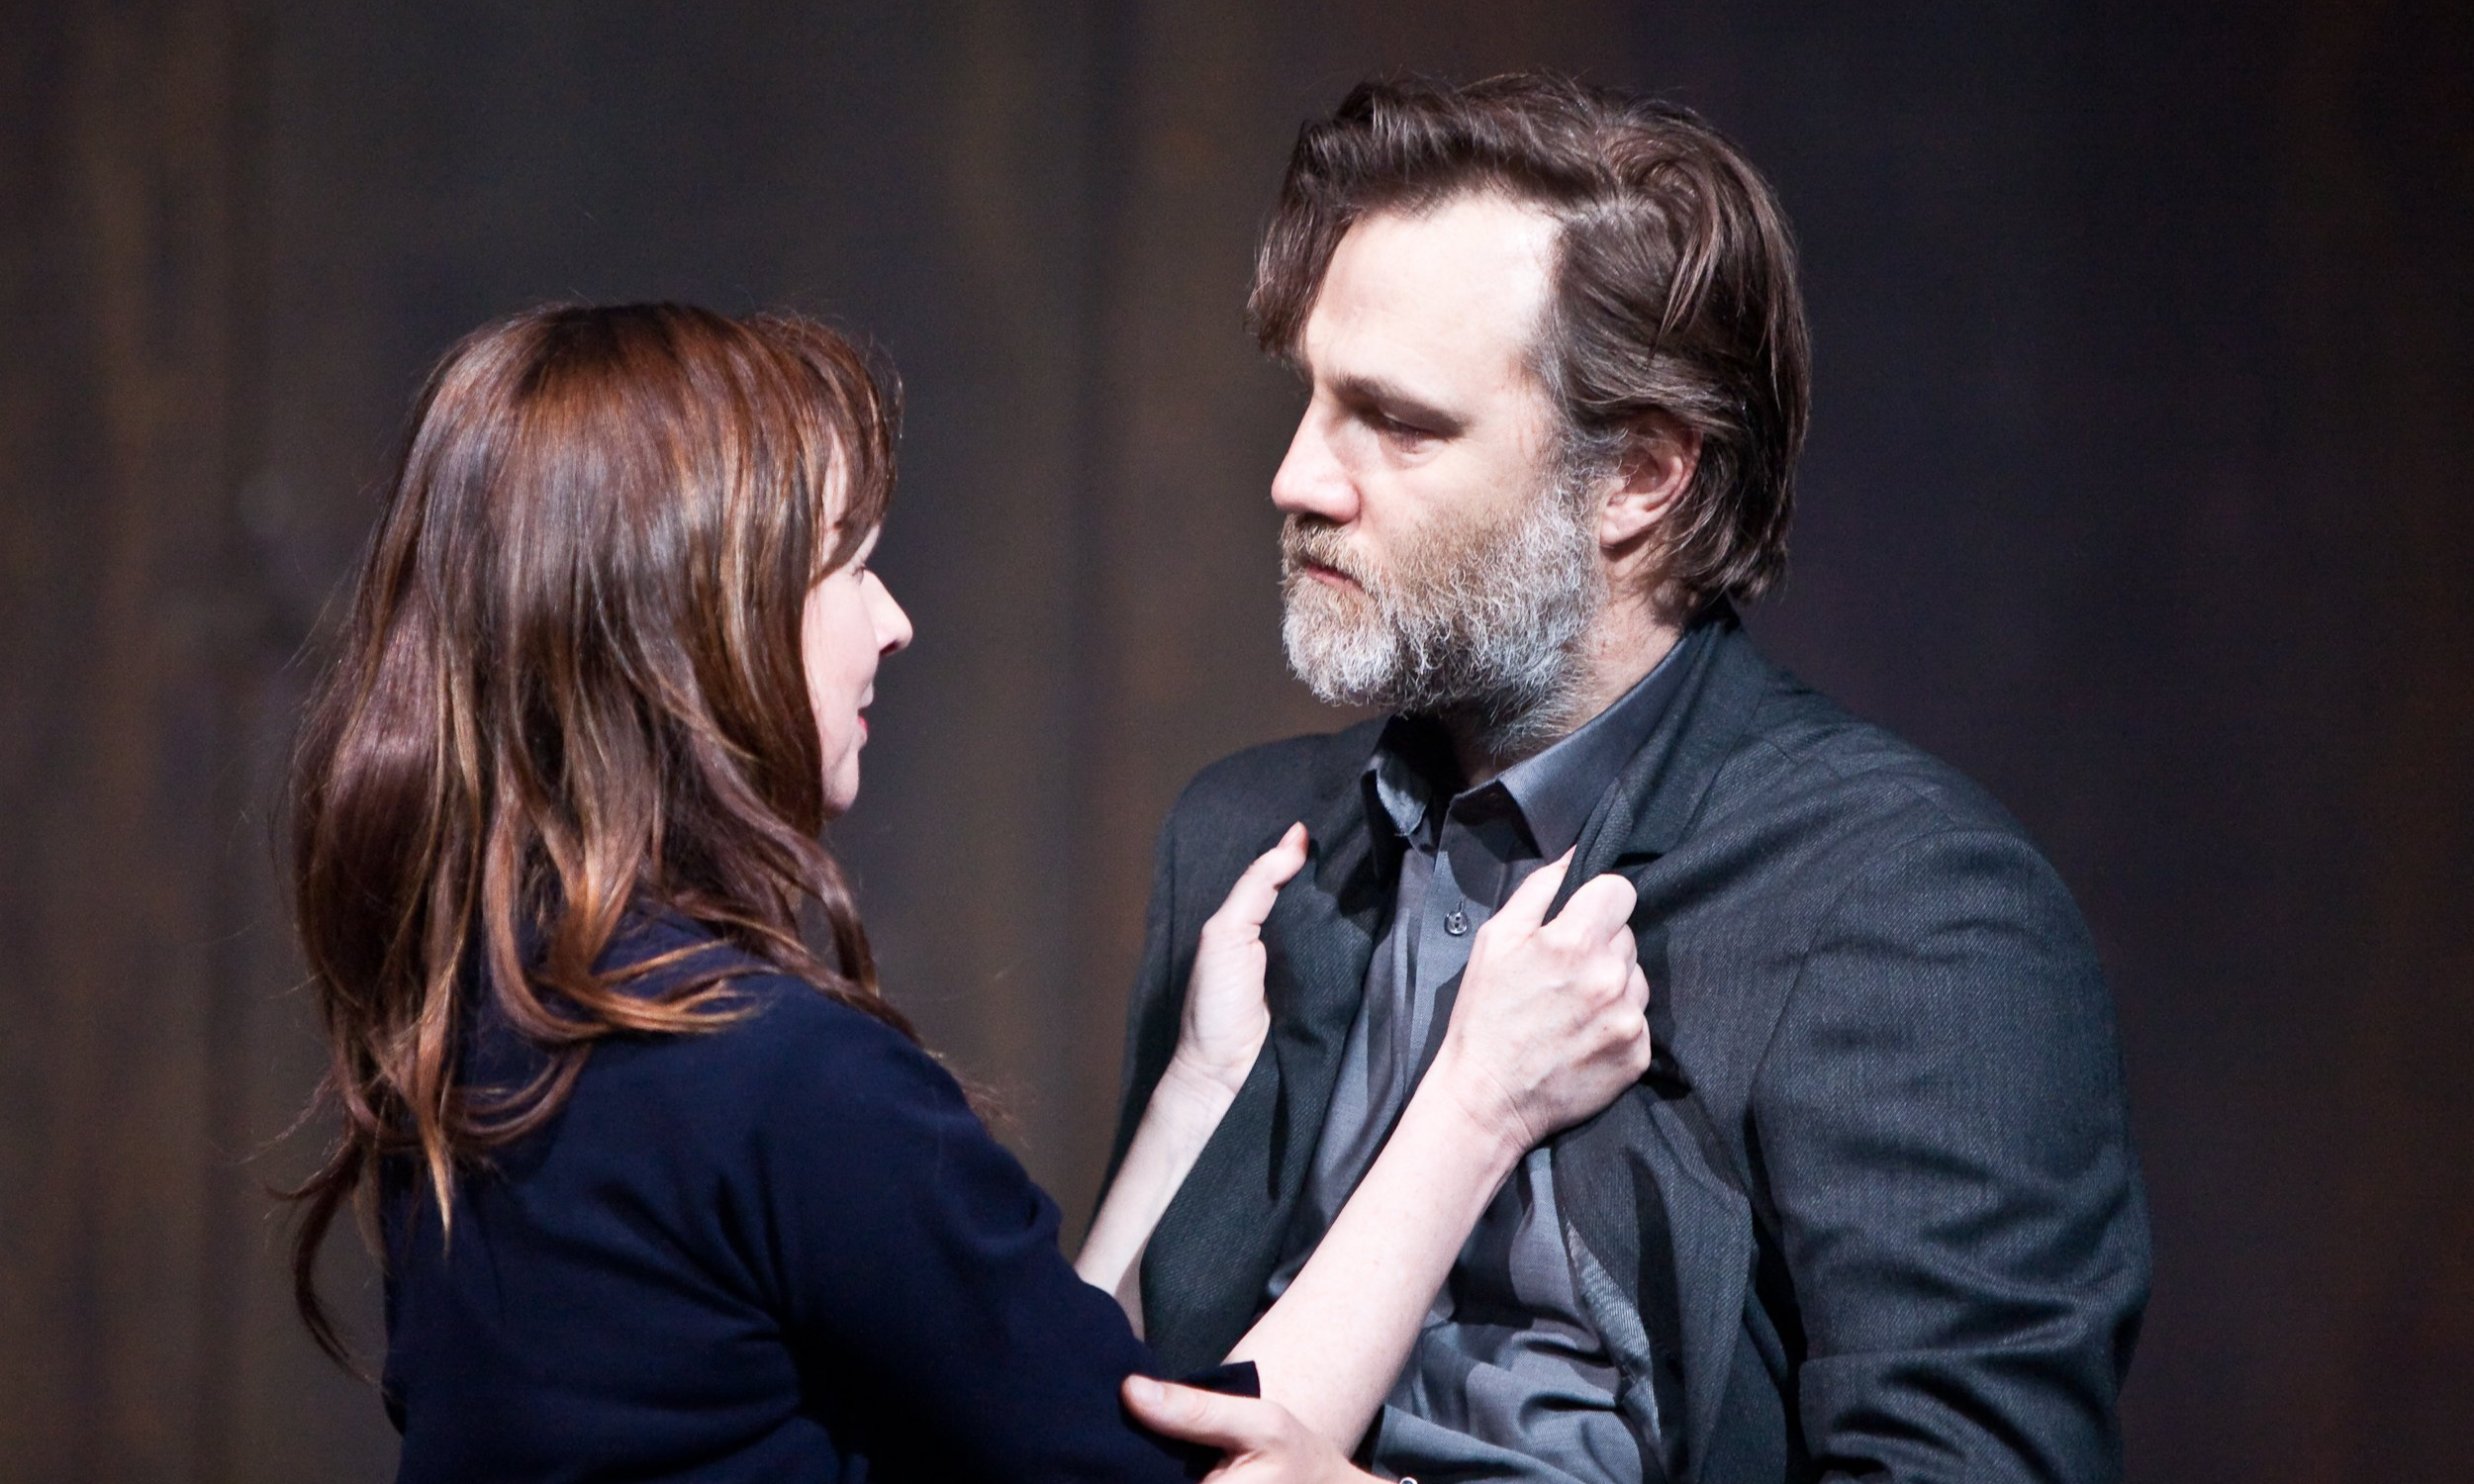 Julia Ford (Lady Macbeth) and David Morrissey (Macbeth) in Macbeth | Liverpool Everyman Theatre © Helen Warner